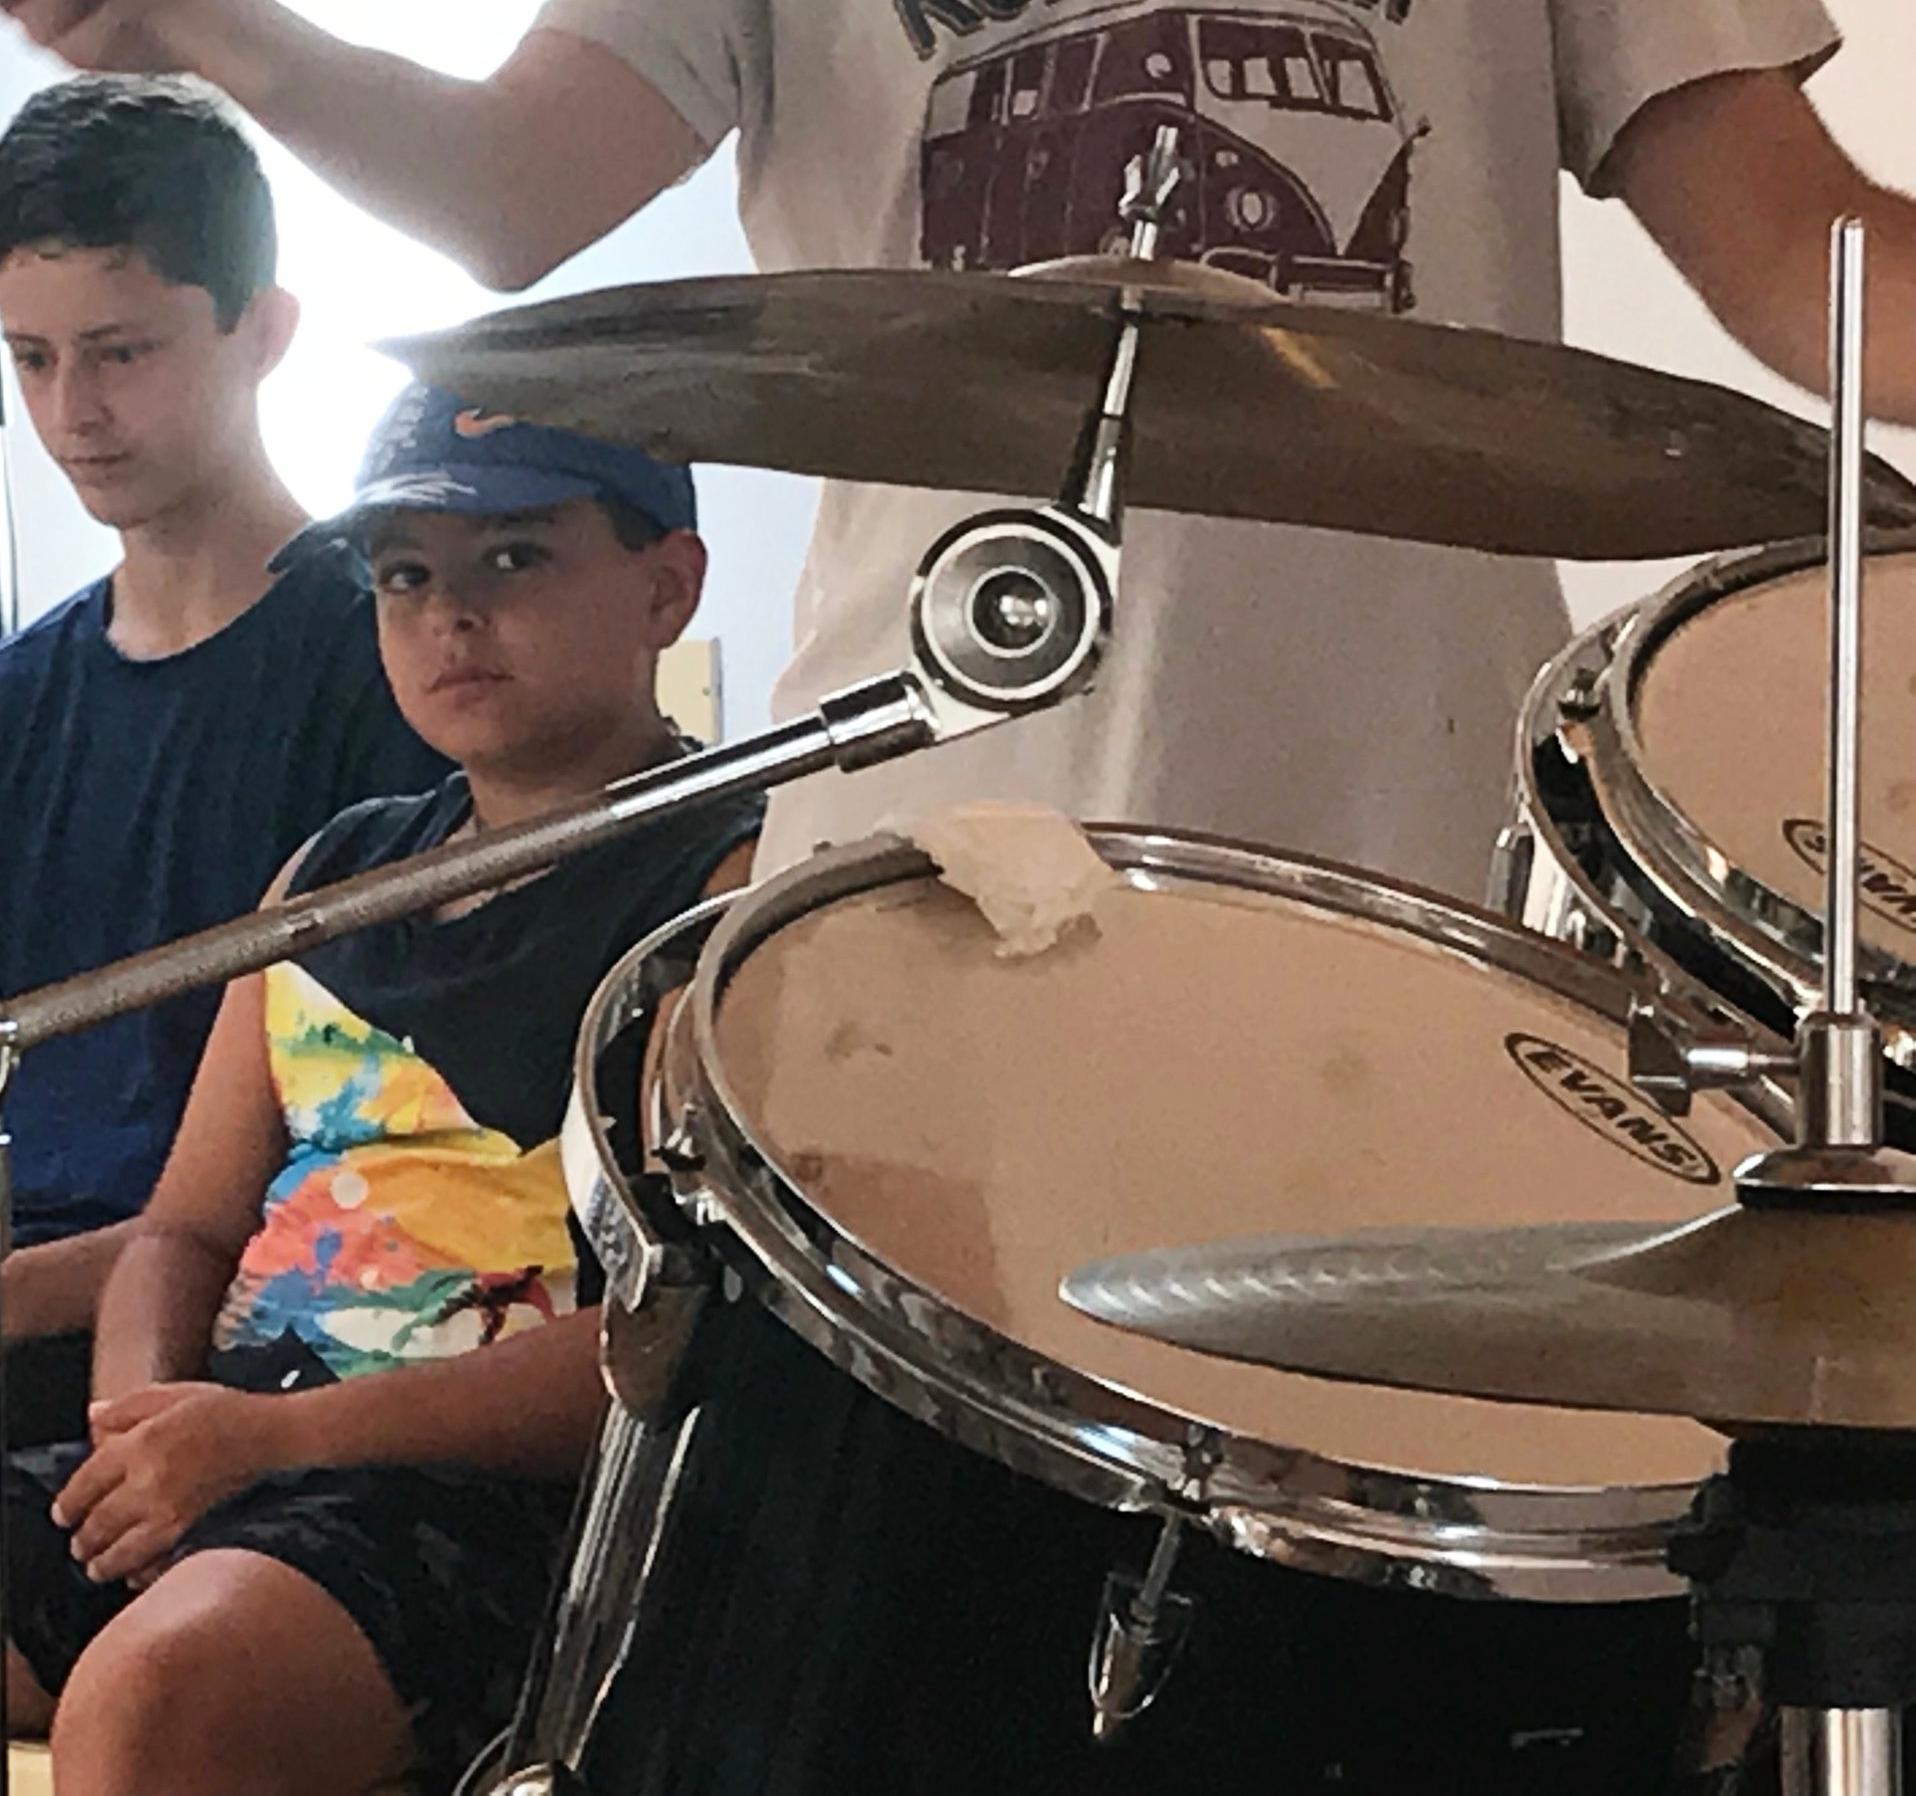 Drum lessons at the Fondazione Passarelli, Salerno, Italy.